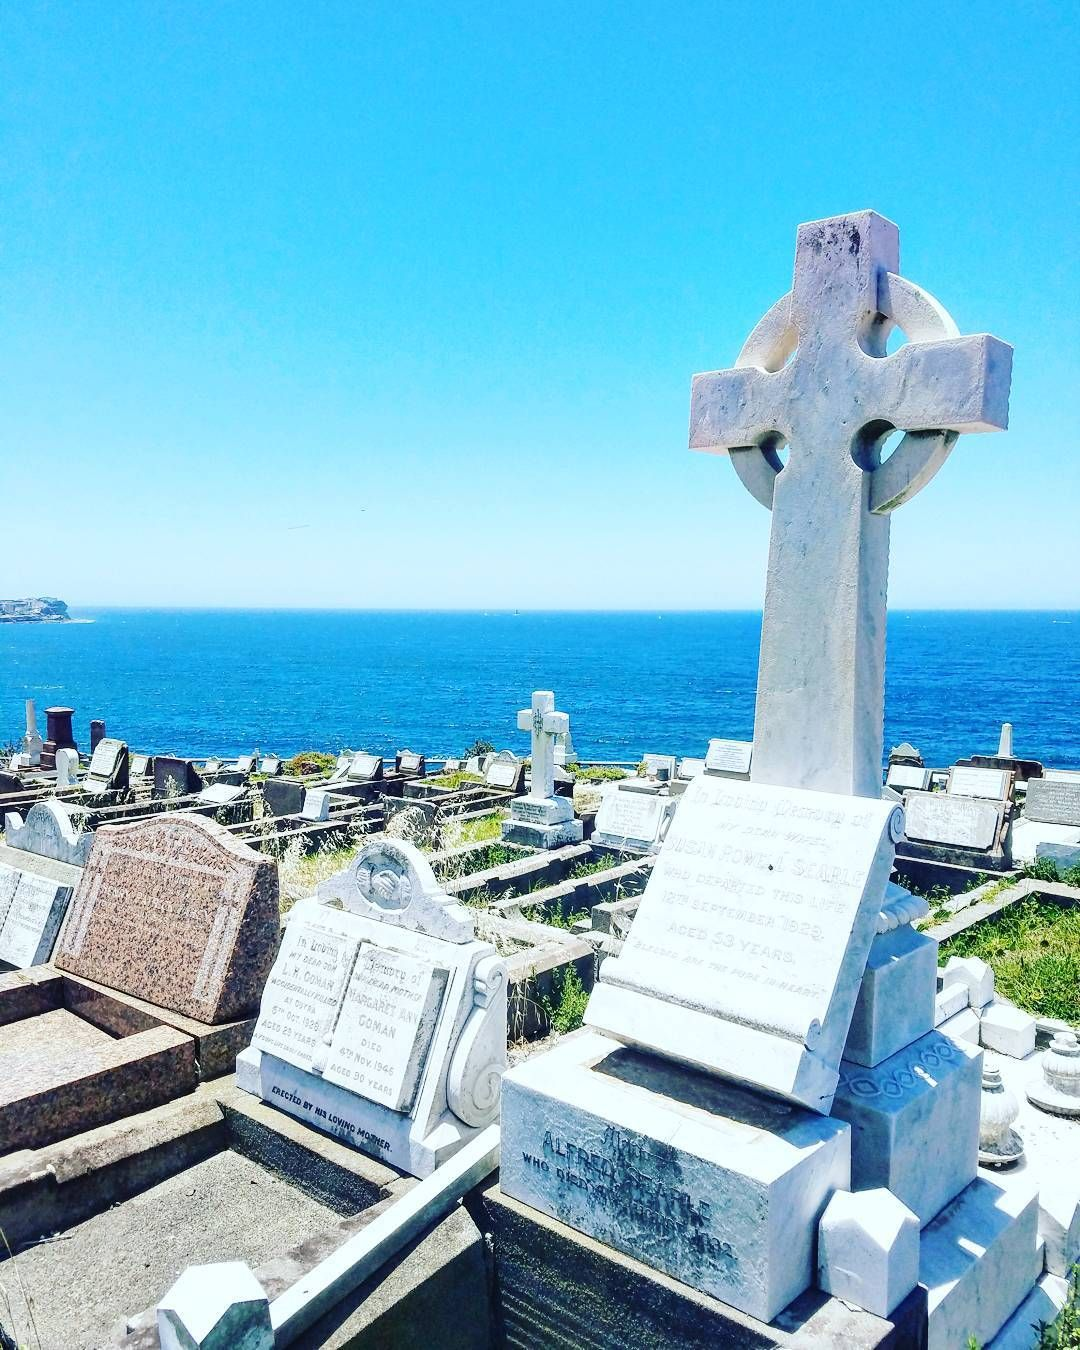 In Sydney the dead have the best views. #waverleycemetery  #waverley #sydney #visitsydney #cemetery #graveyard #hautausmaa #hauta #pacific #tyynivaltameri #travel #matkalla #reissu #mondolöytö #ig_travel  #cntravel #passionpassport (via Instagram)